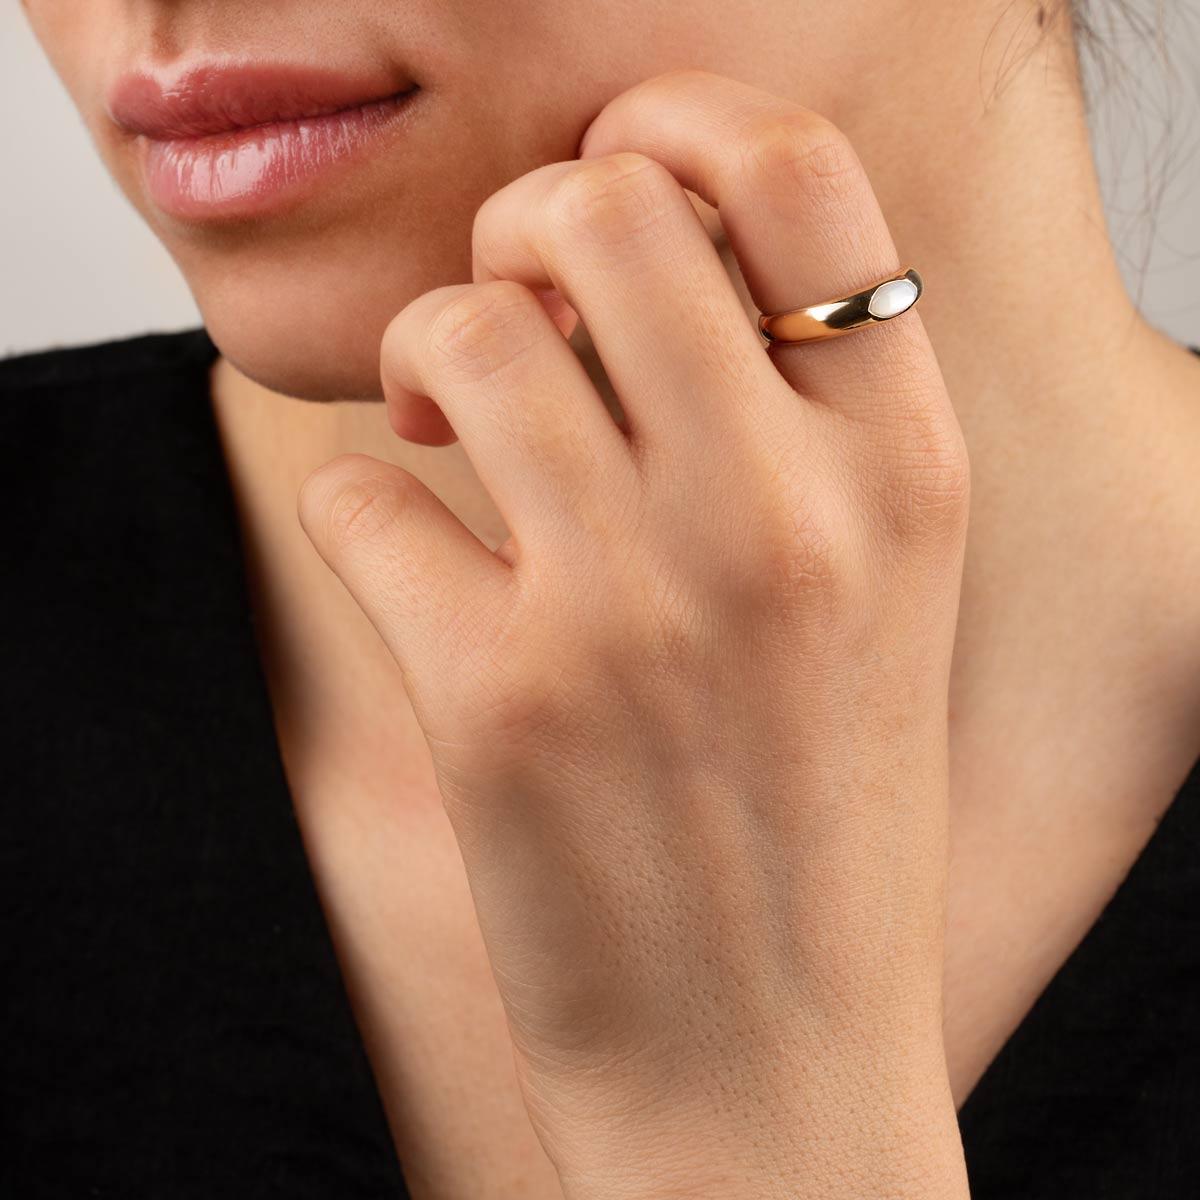 انگشتر طلا دامله صدف مارکیز